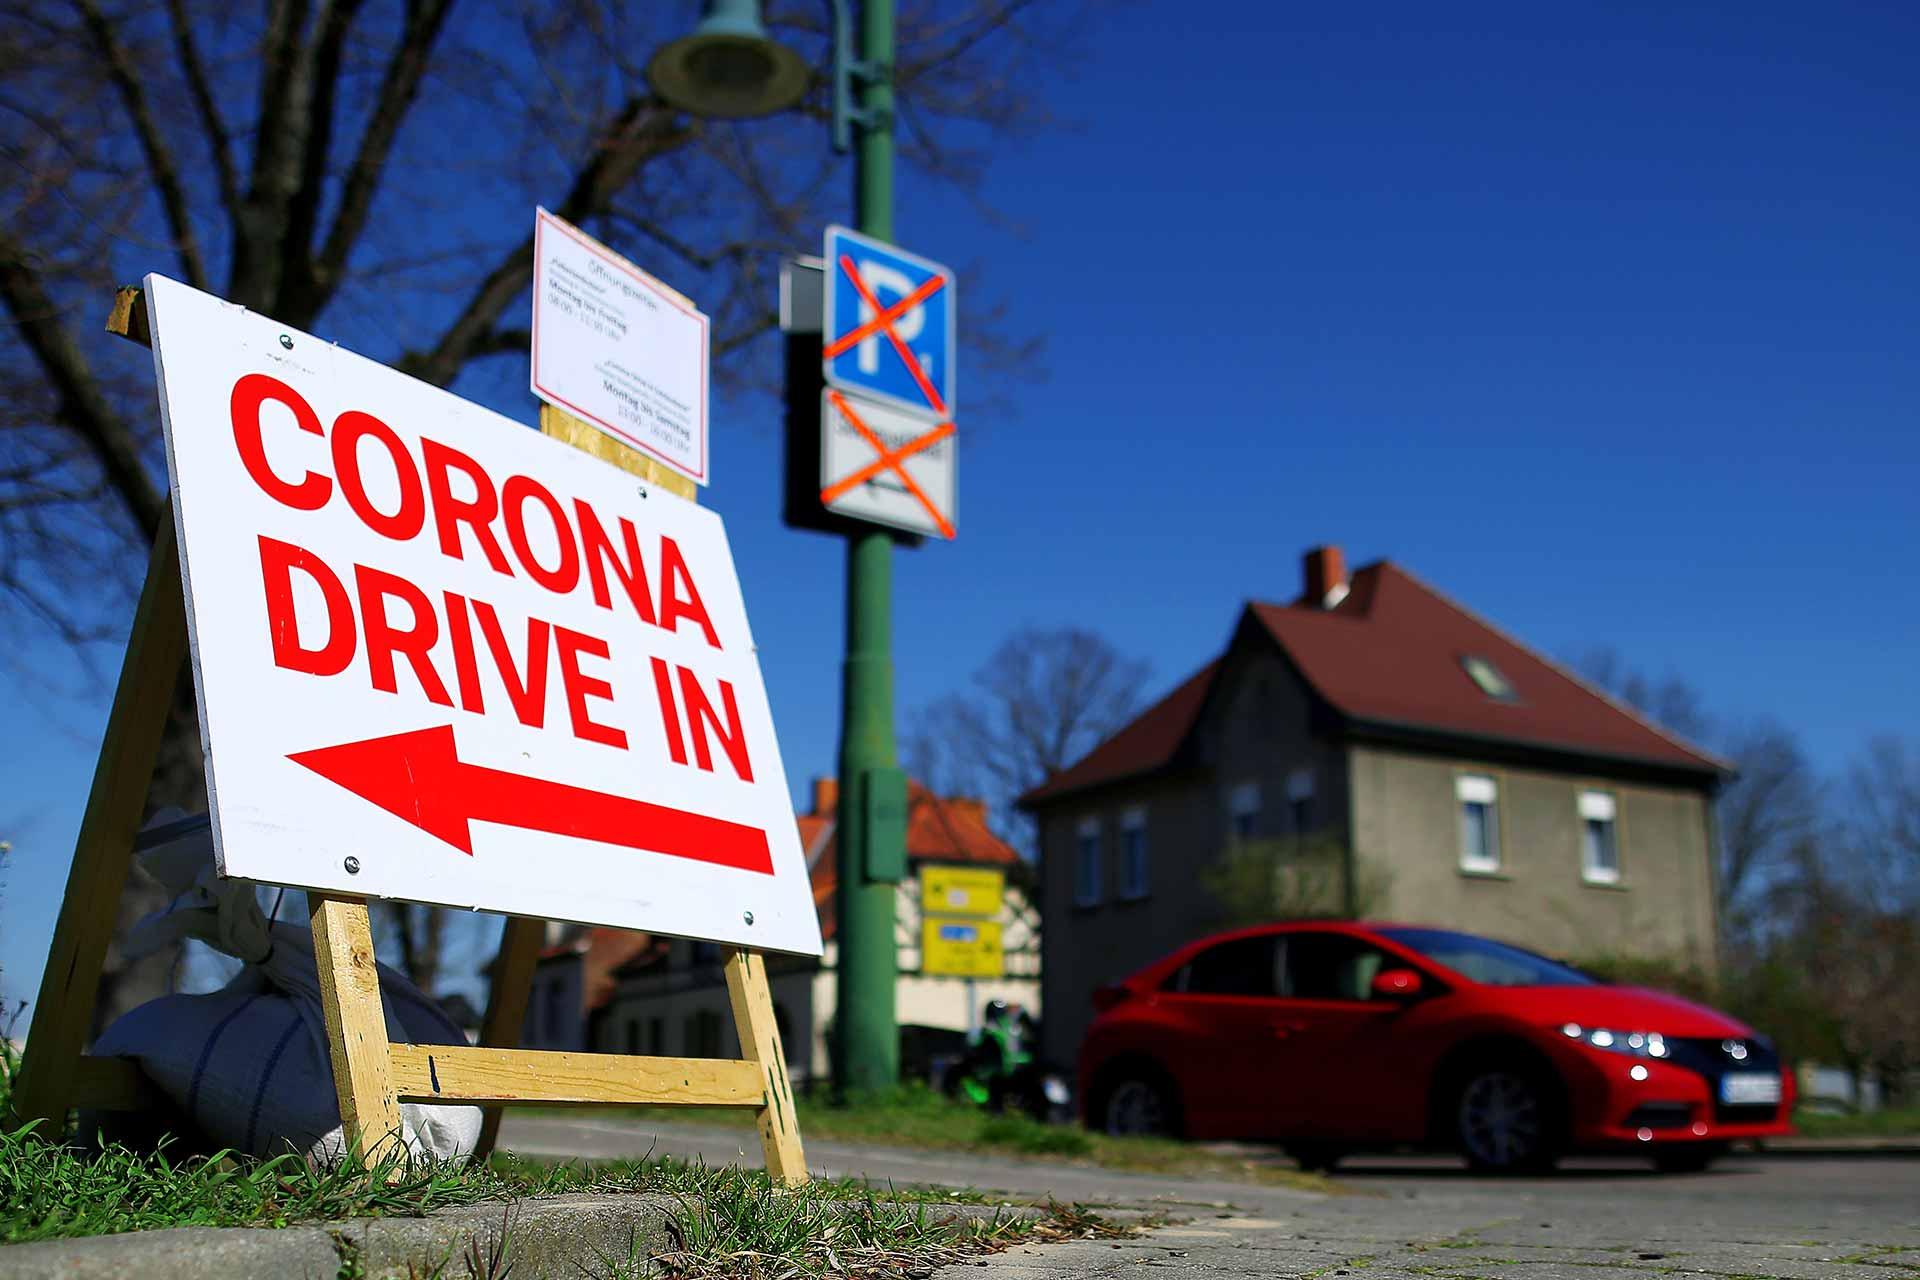 Corona Drive-In Germany Coronavirus test